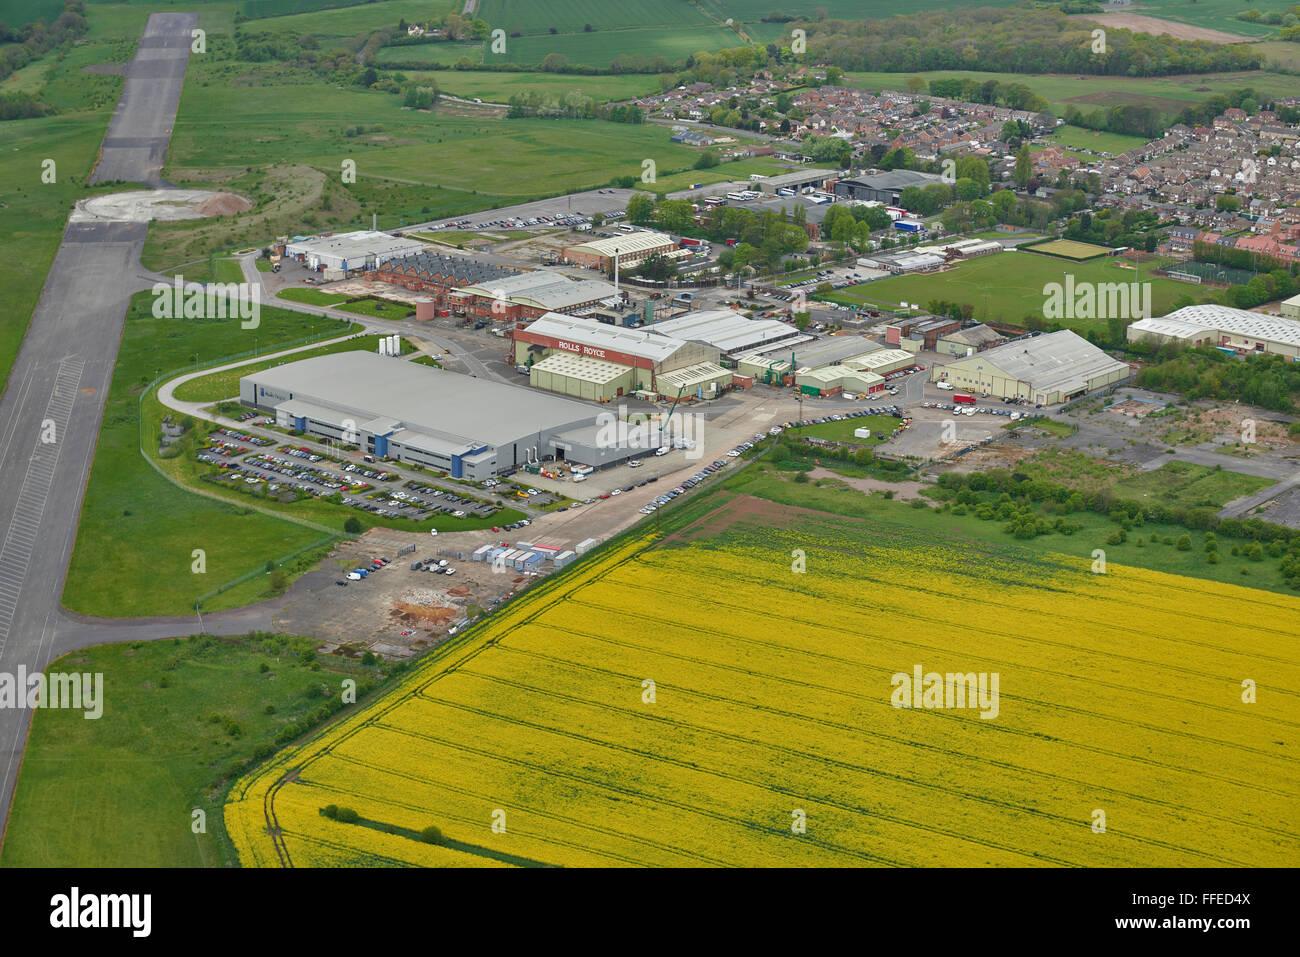 An aerial view of Hucknall Aerodrome near Nottingham - Stock Image